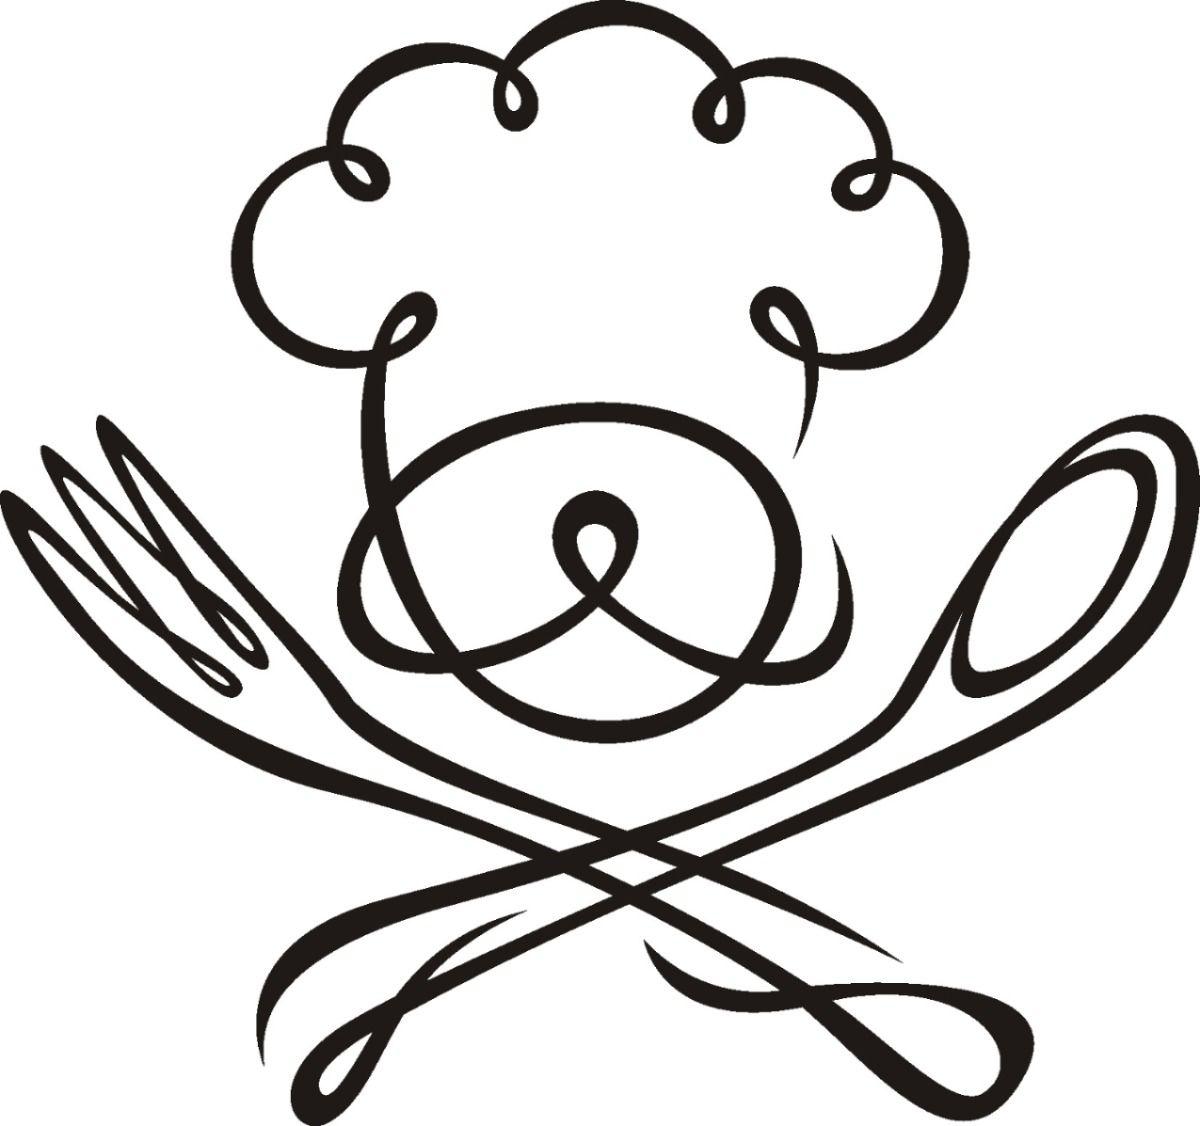 De pared dise os originales chef 1 10900 en mercadolibre for Utensilios de cocina logo